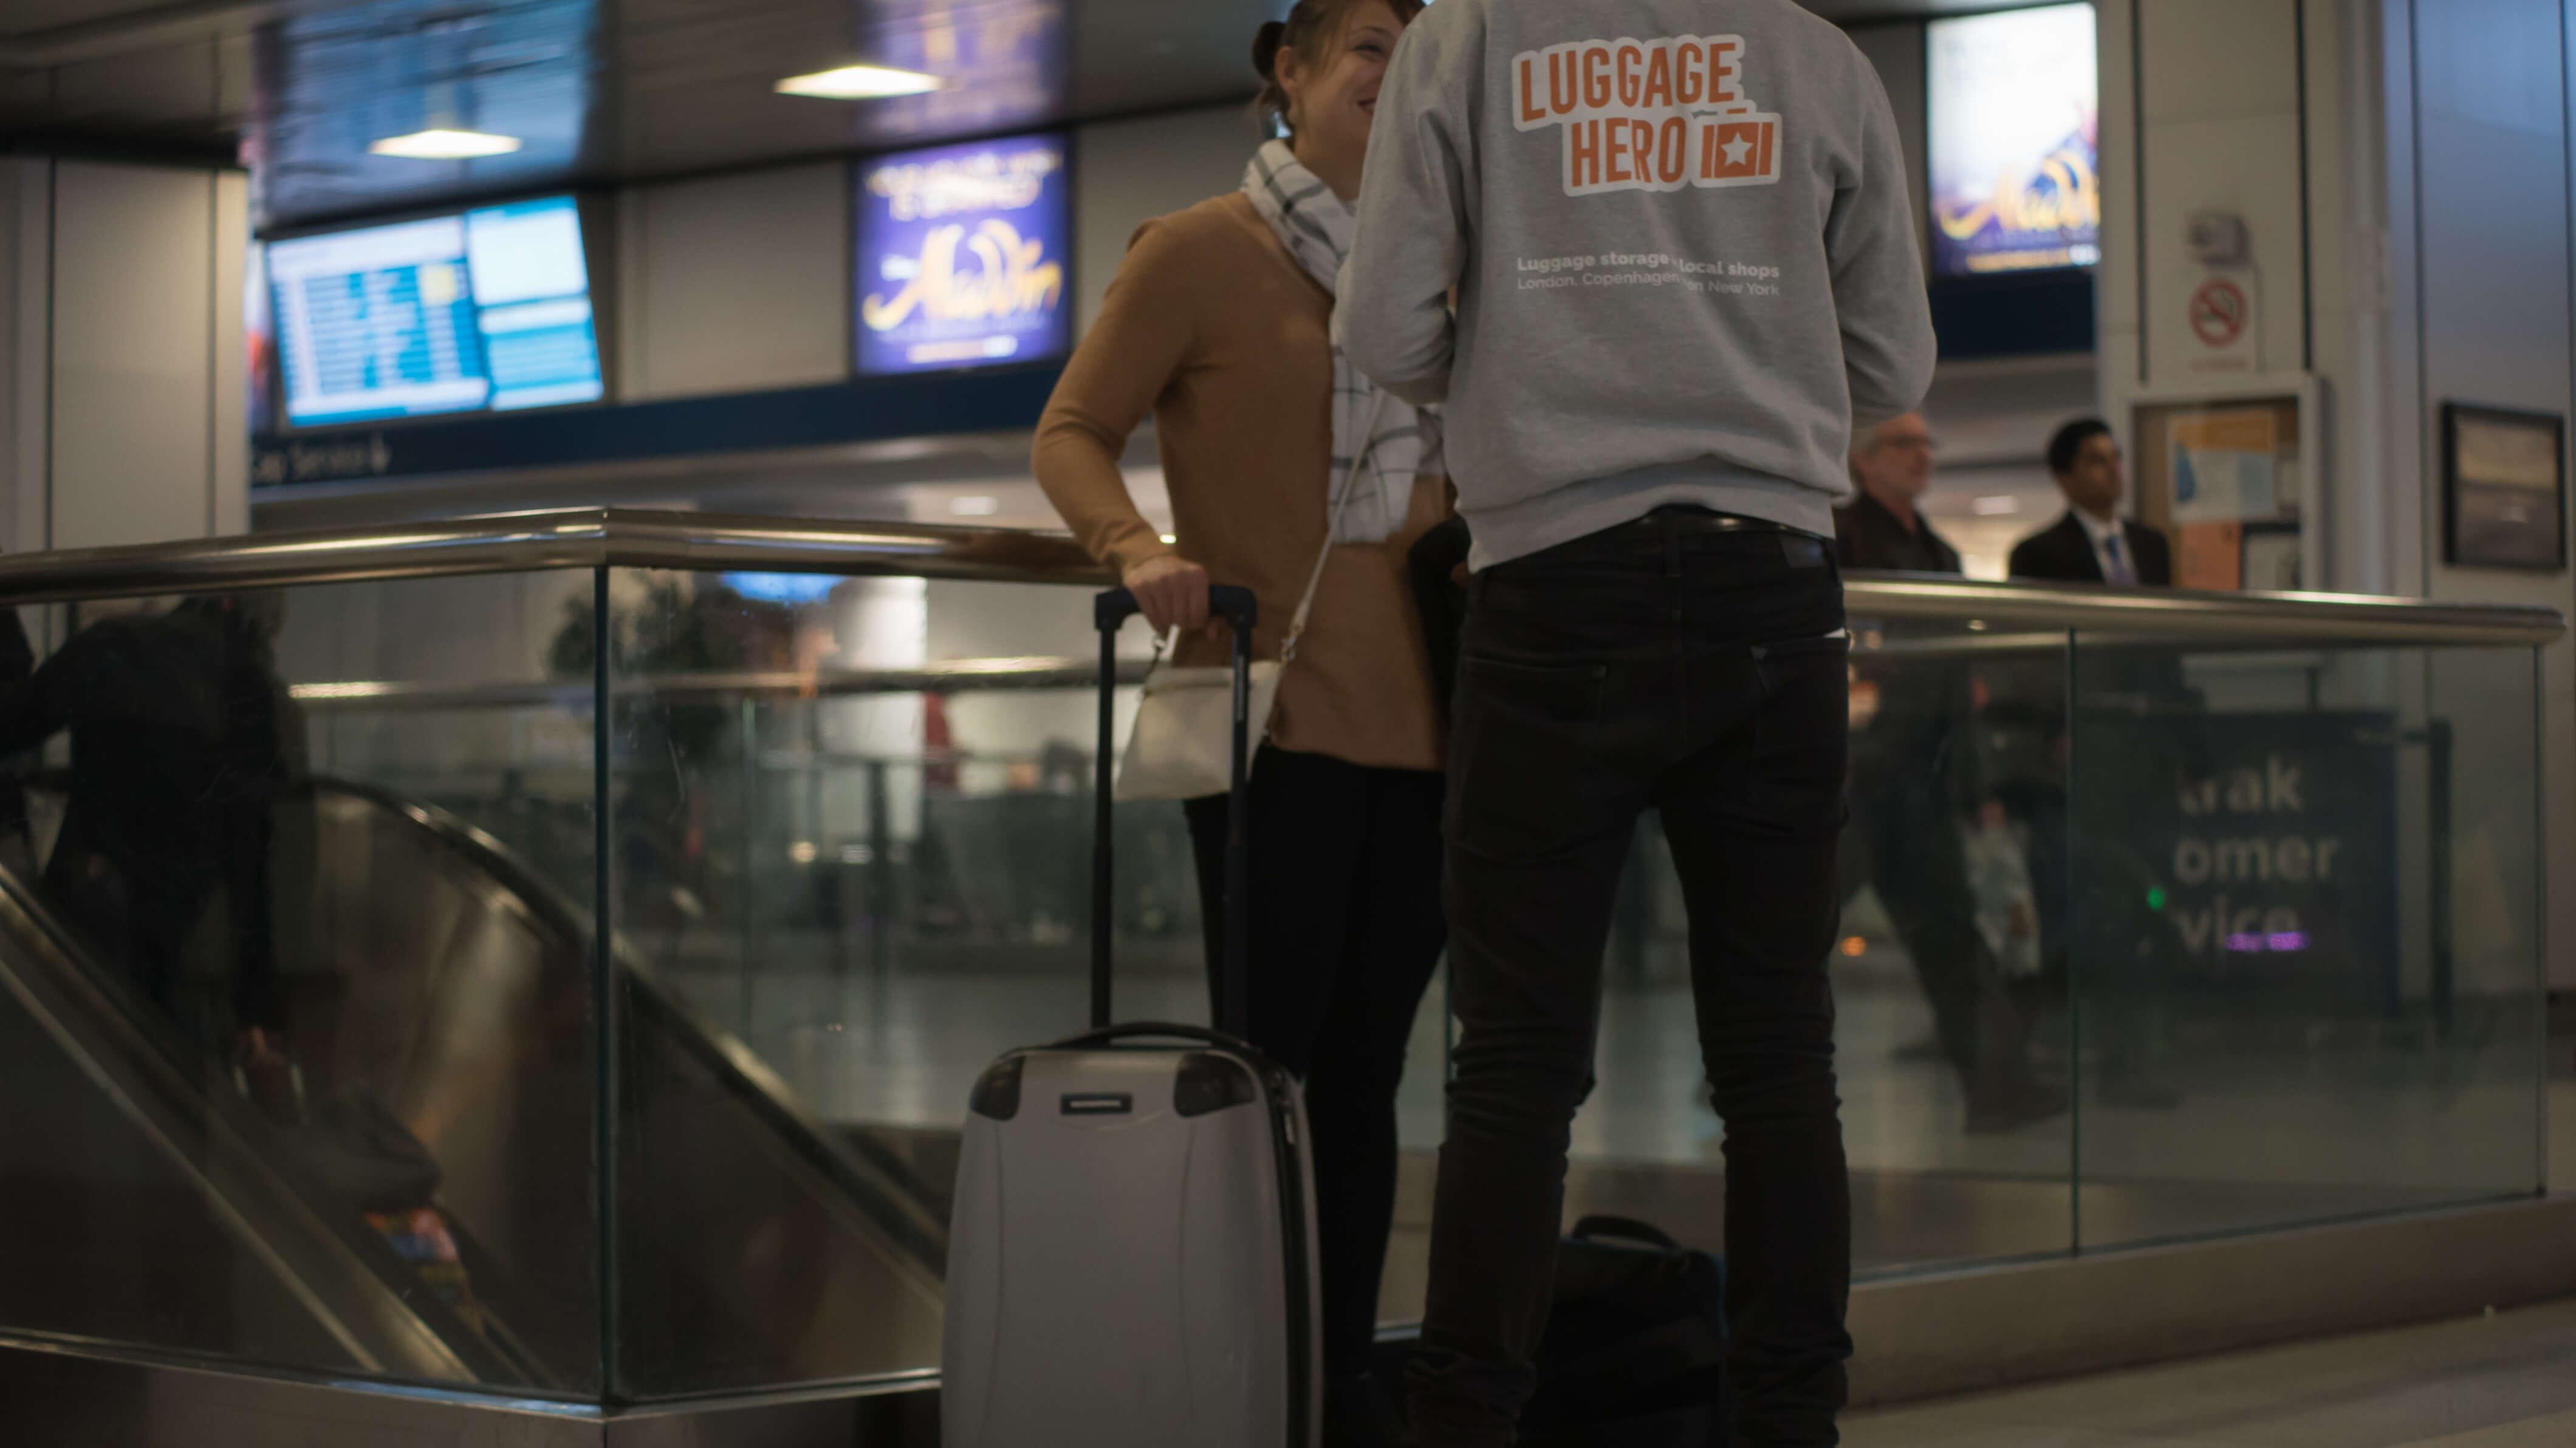 Luggage Storage Newark Penn Station